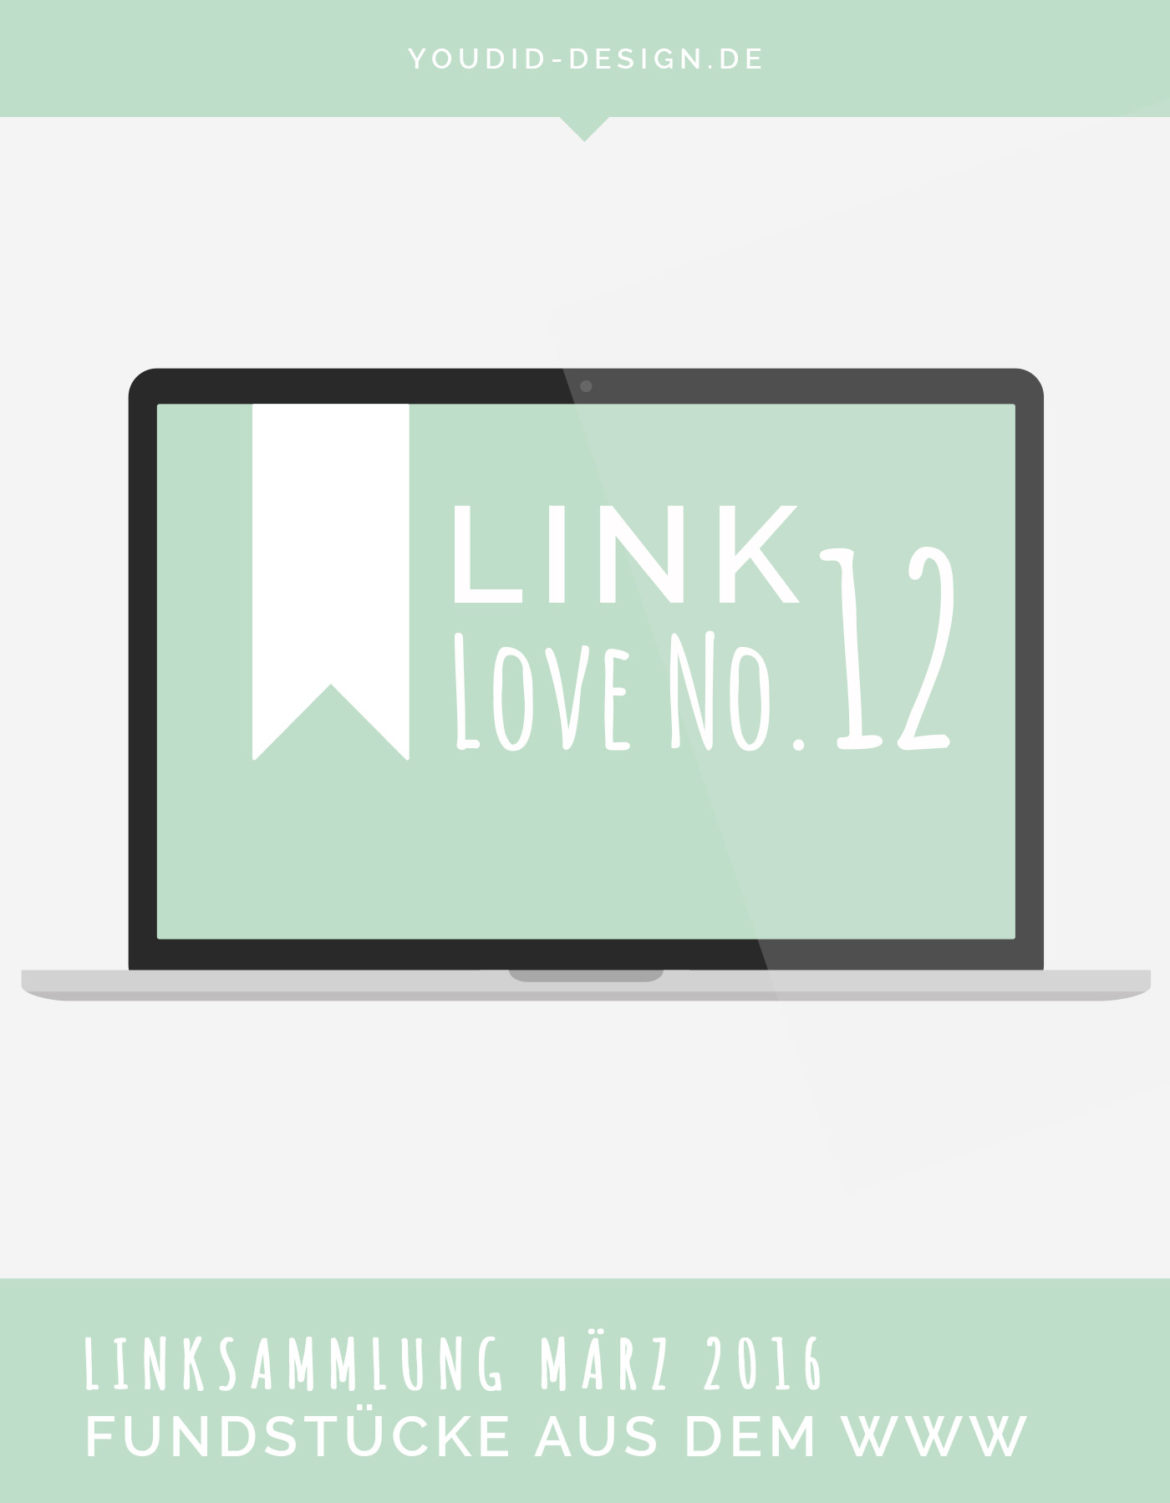 Linksammlung Linklove No 12 März 2016 | www.youdid-design.de